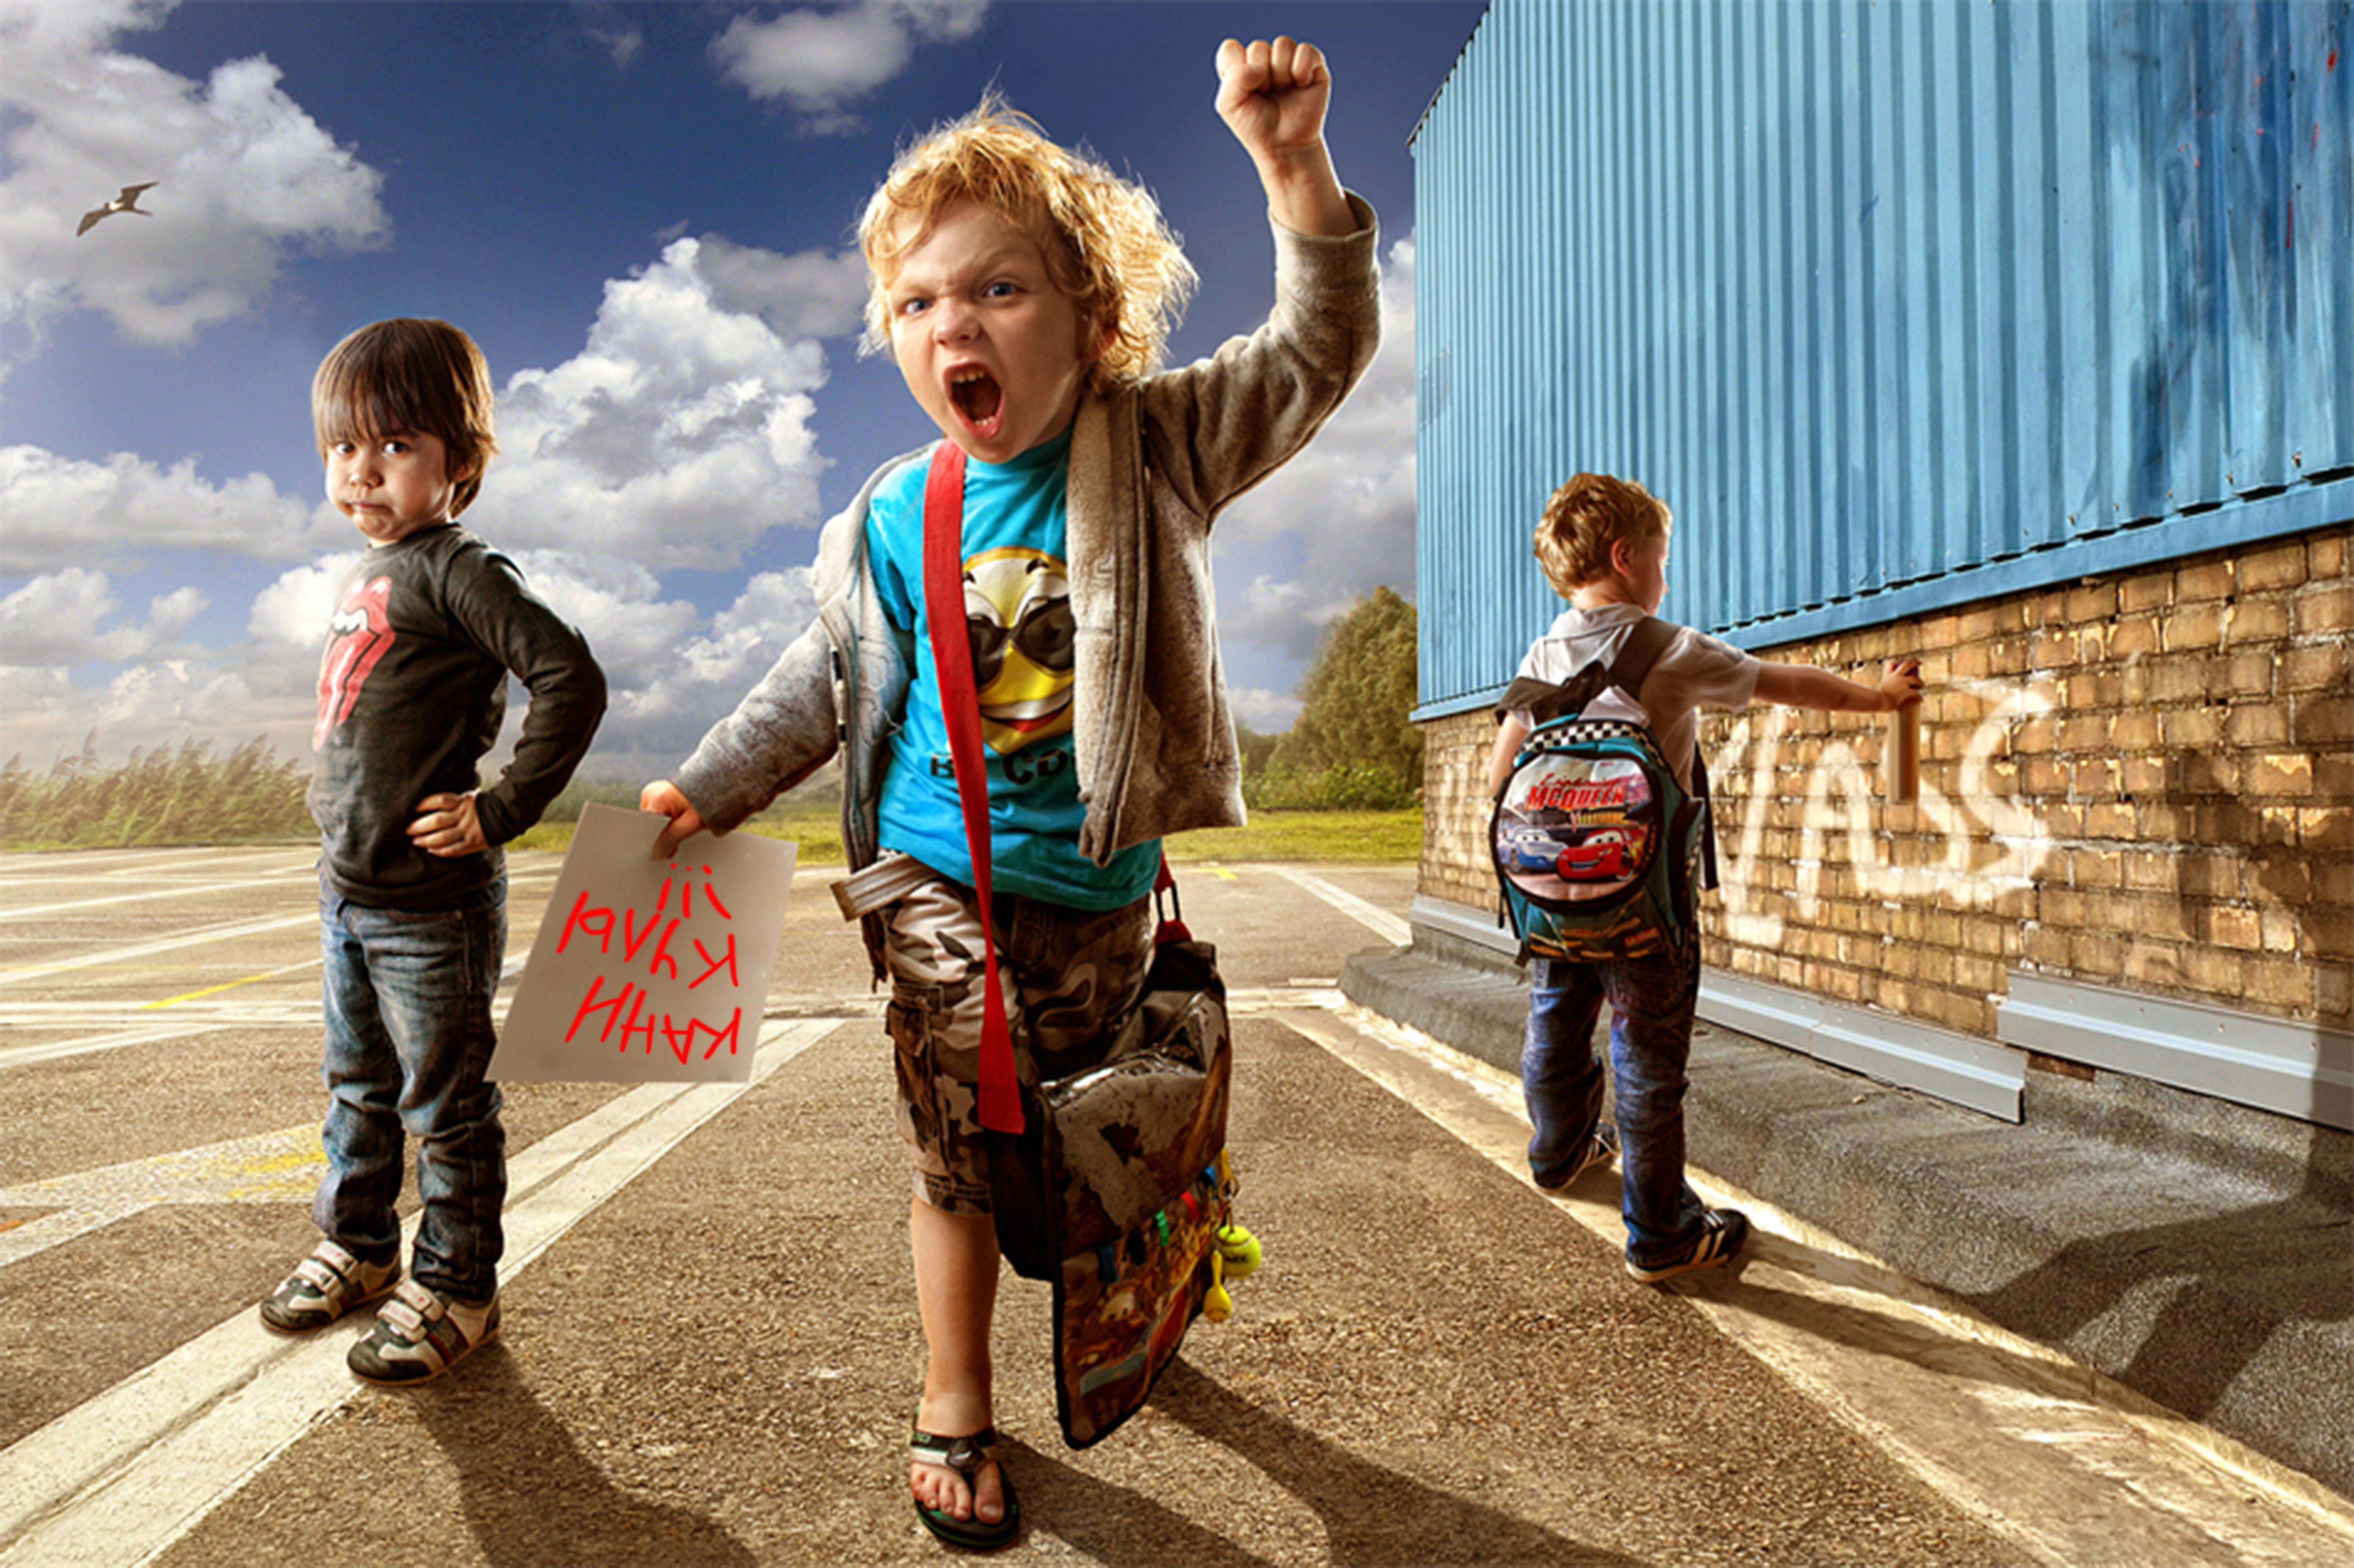 Реклама для детей: как снять ребенка в рекламе, кастинги, съемки 3